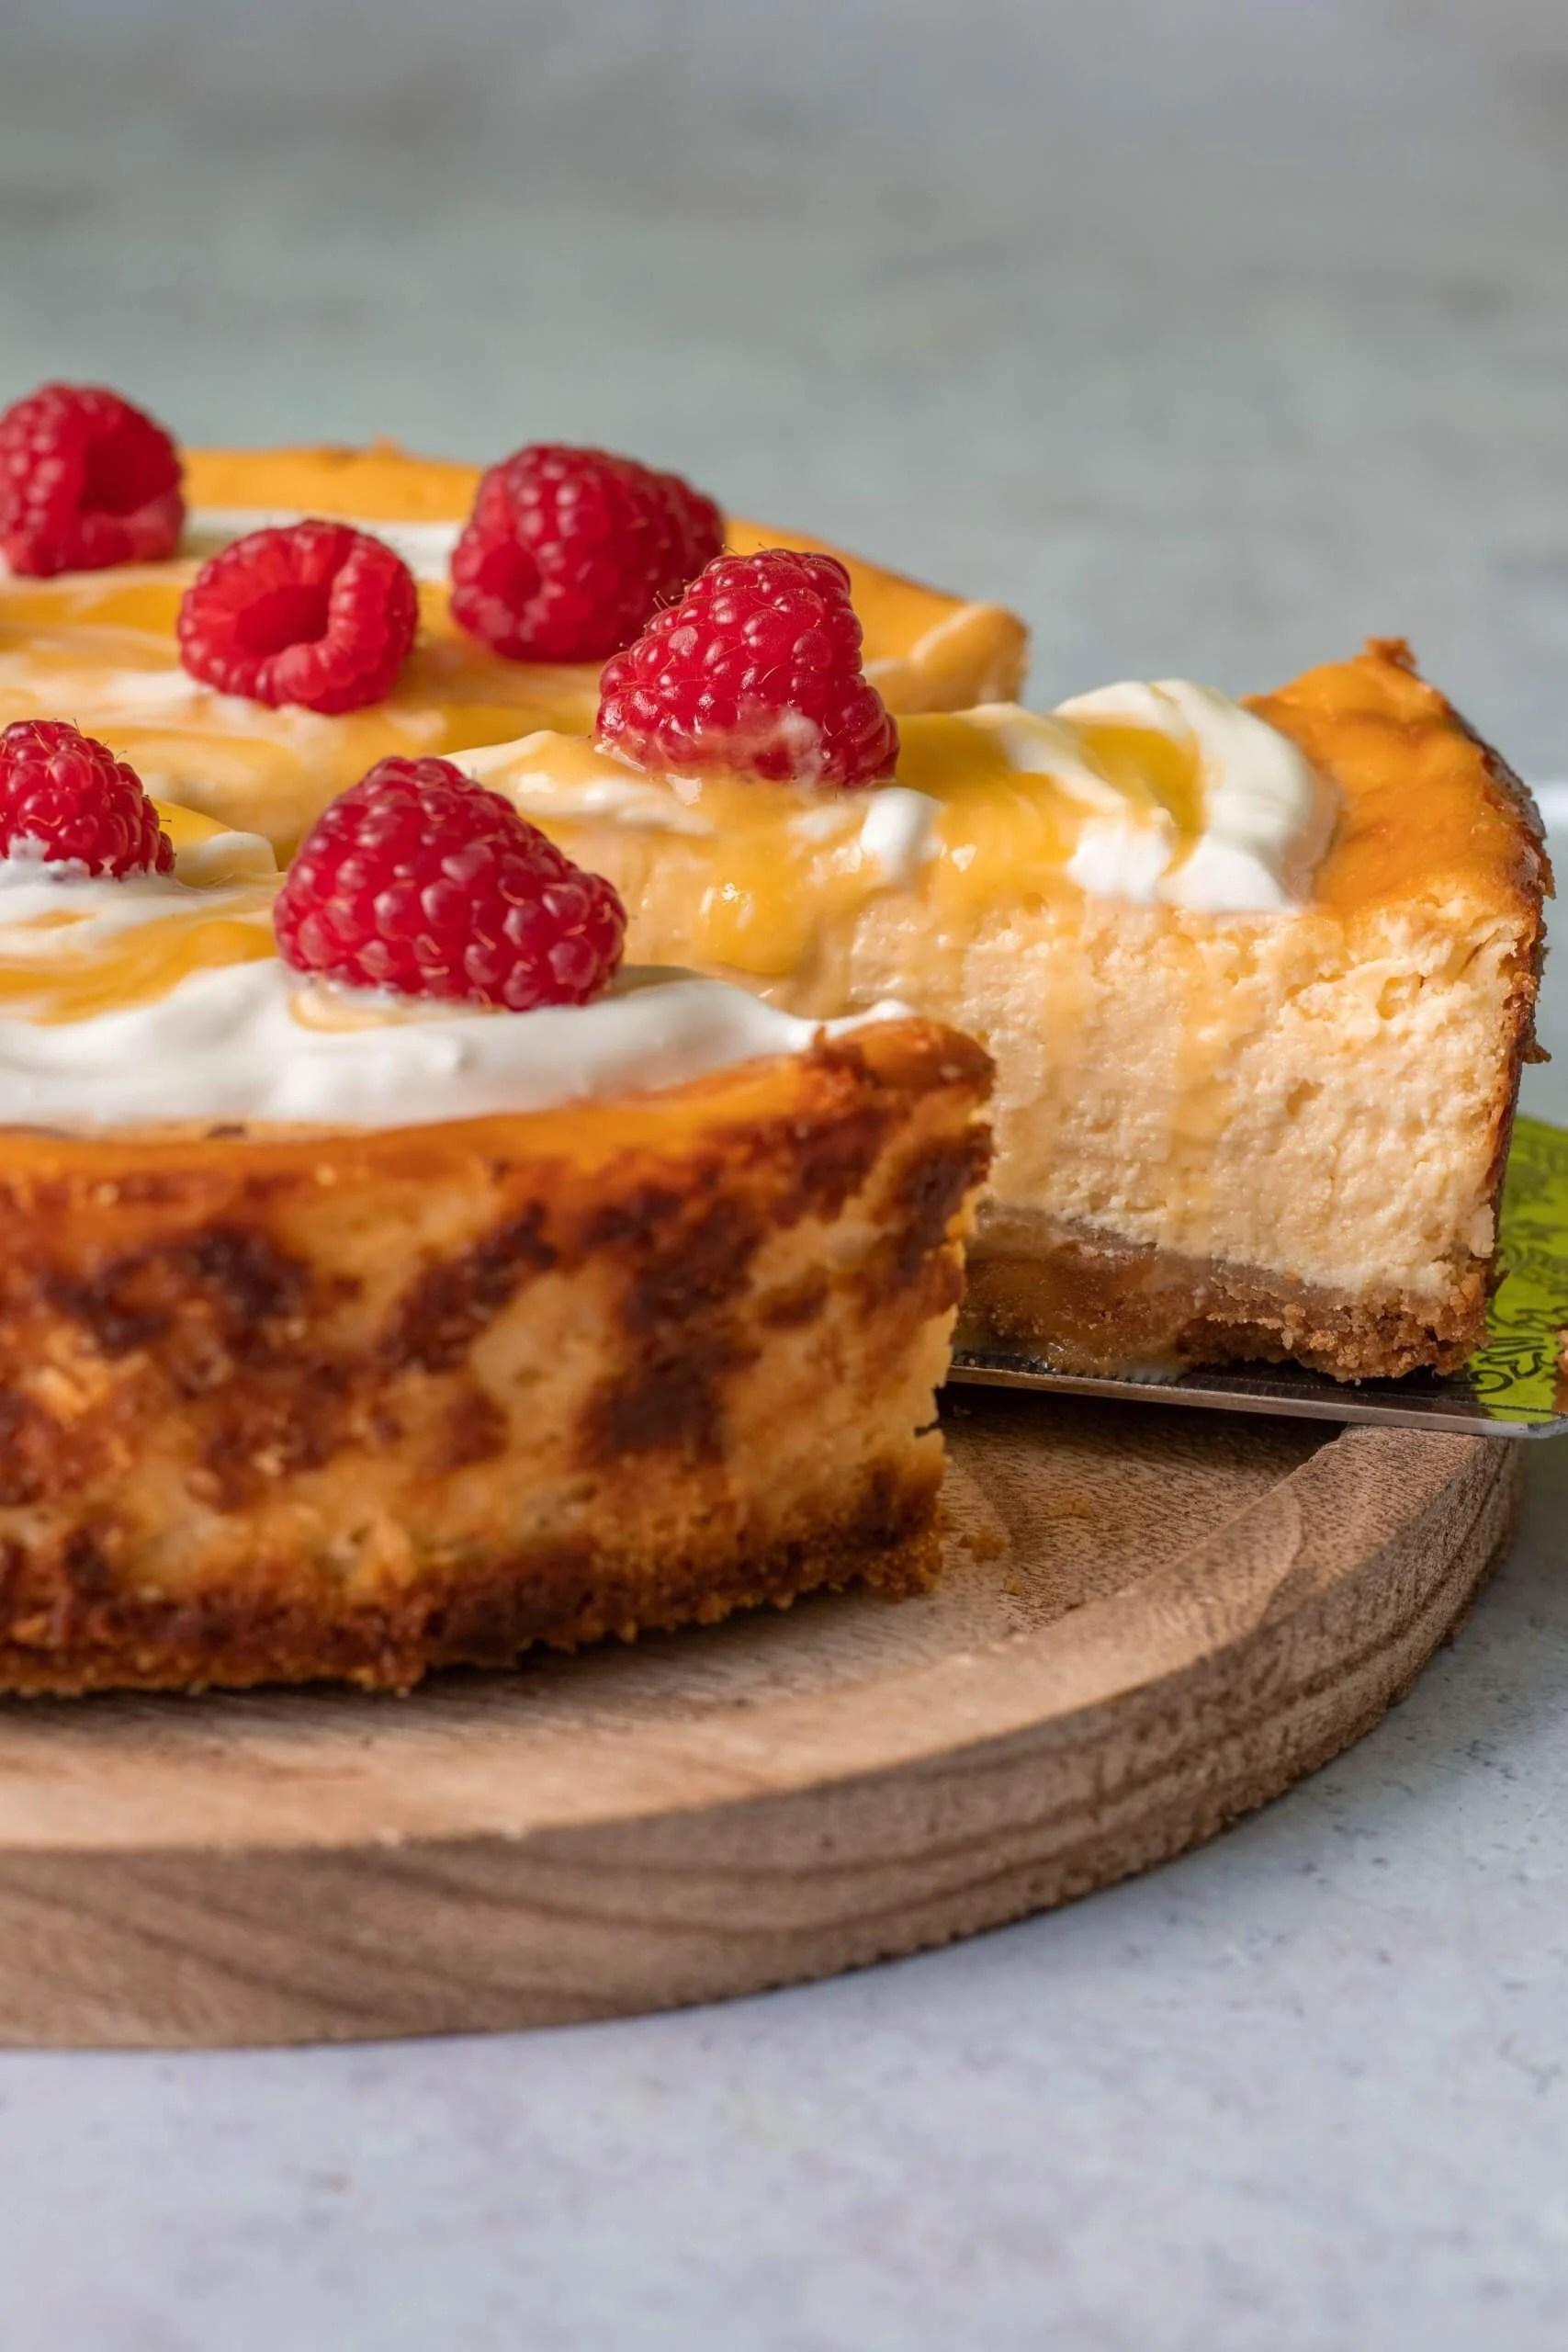 Citroen cheesecake